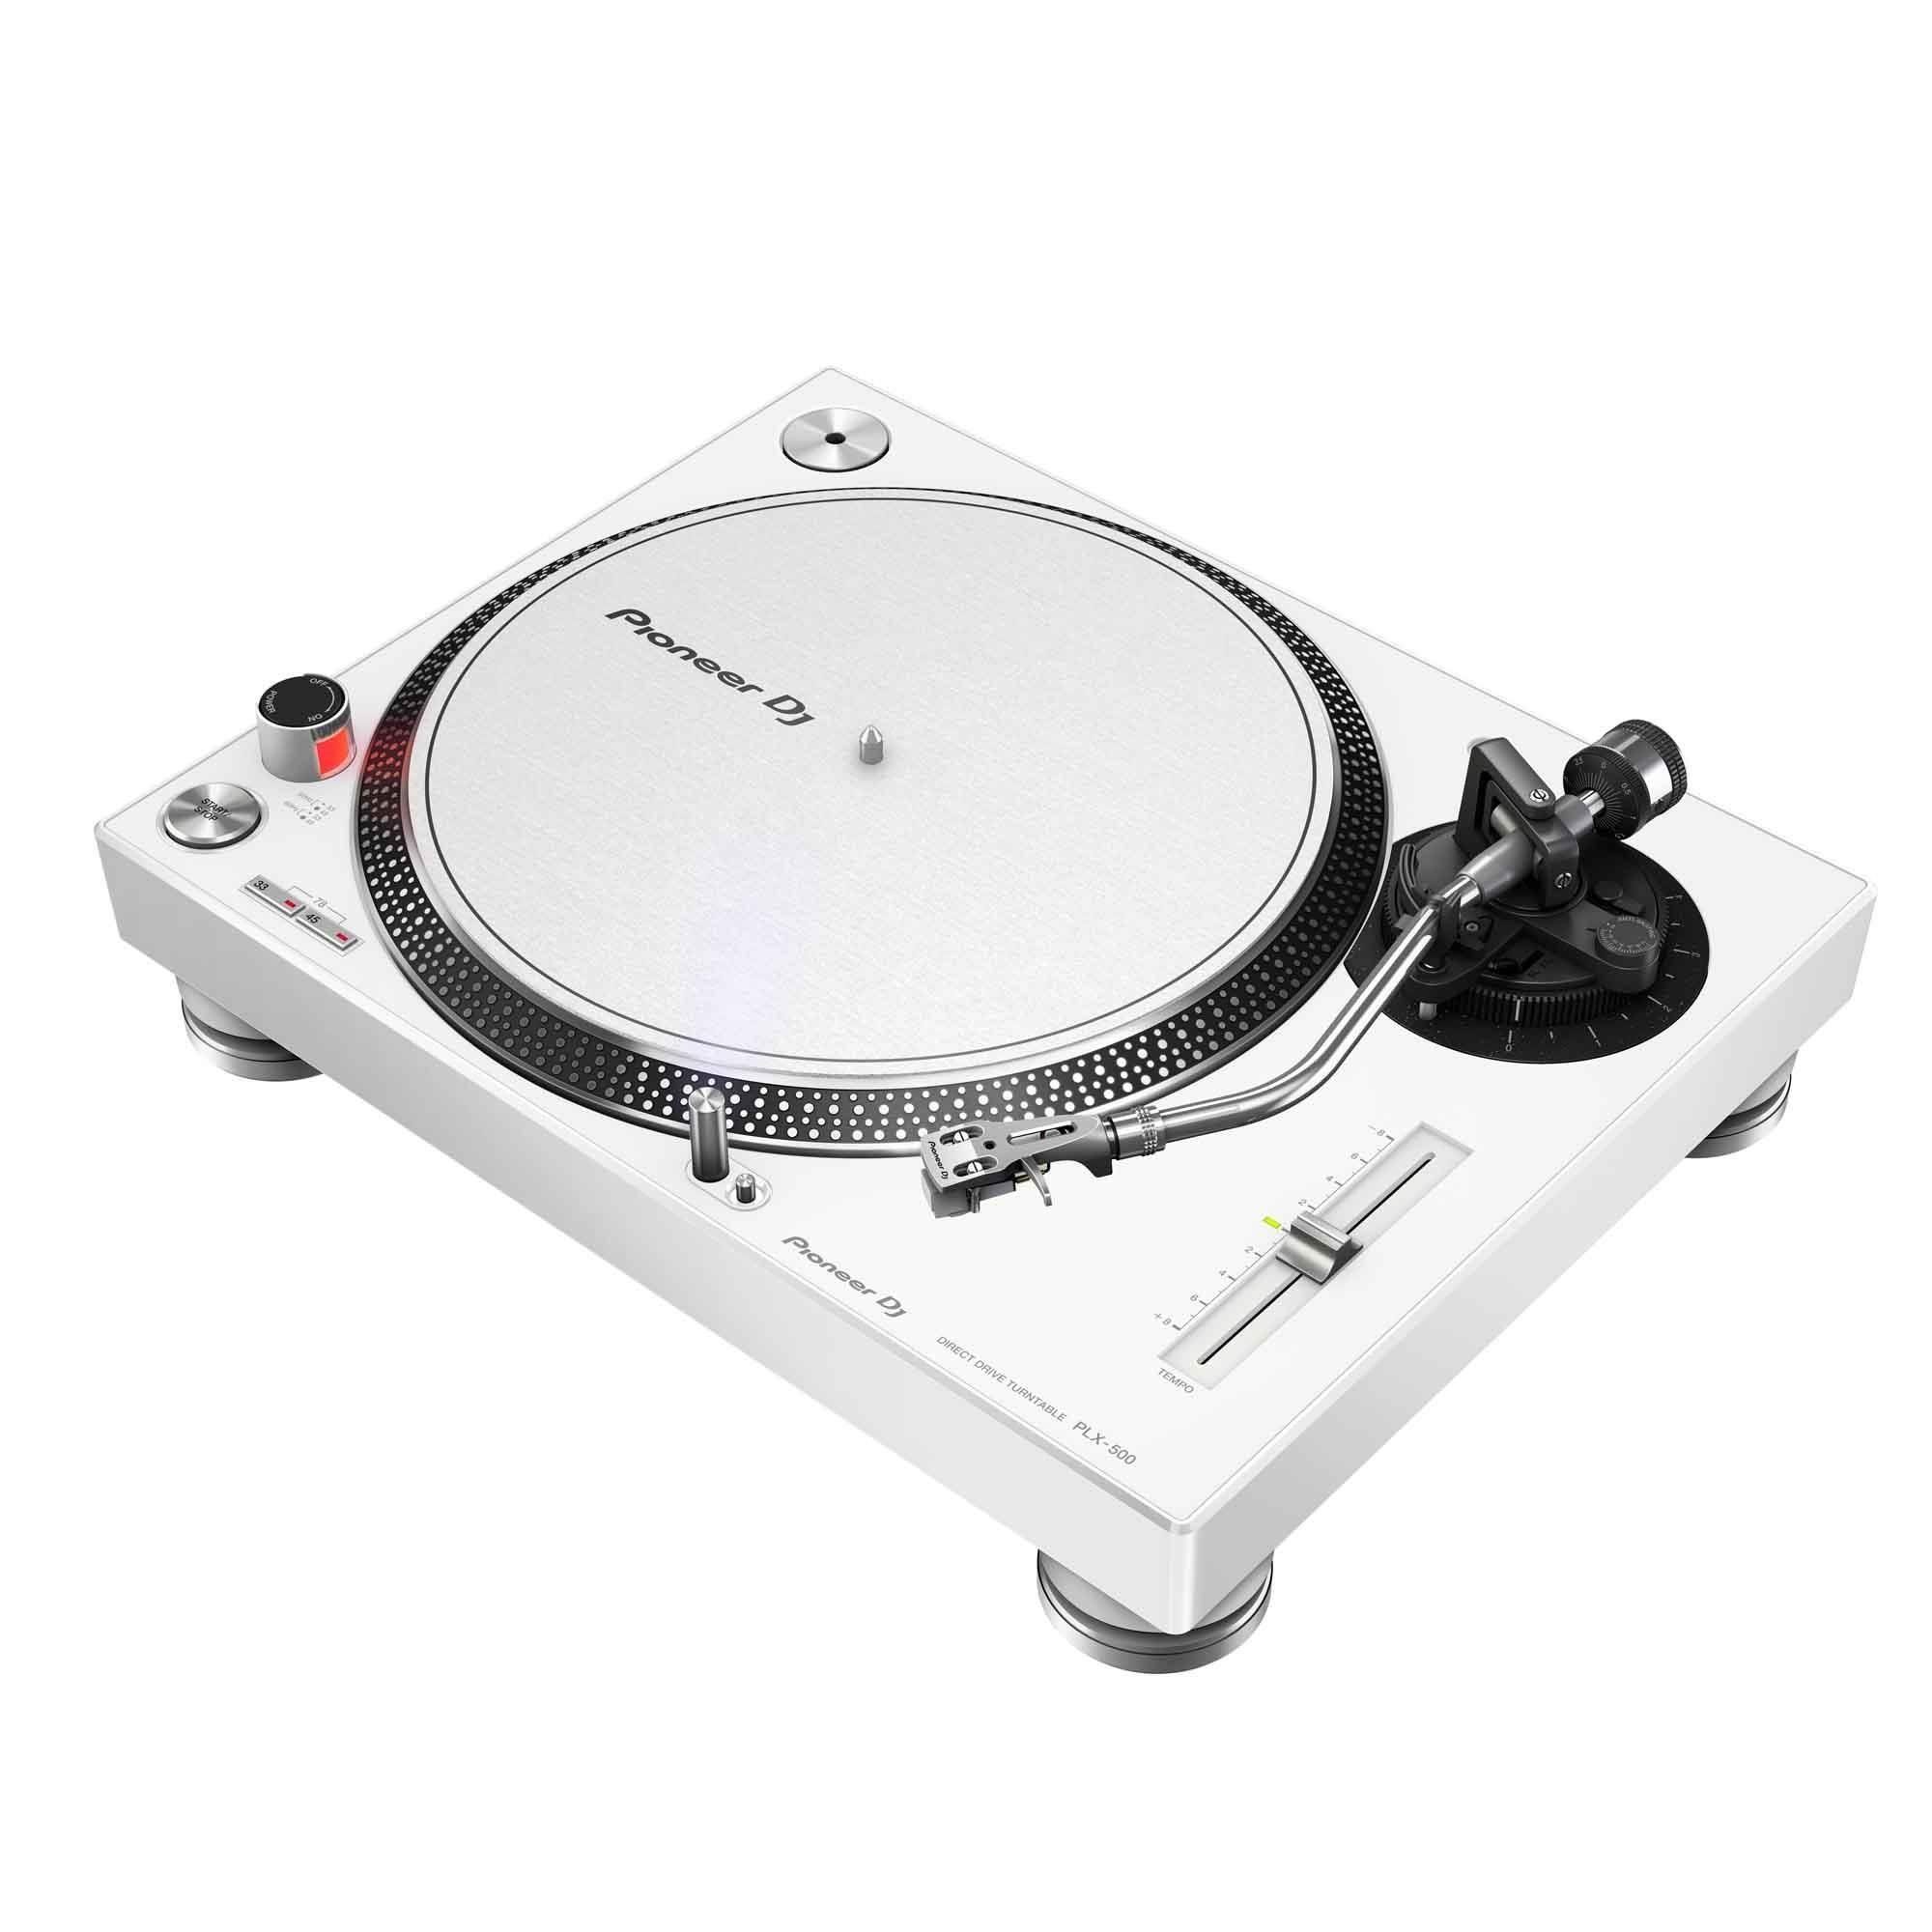 Pioneer PLX-500-W Direct Drive USB Turntable - White